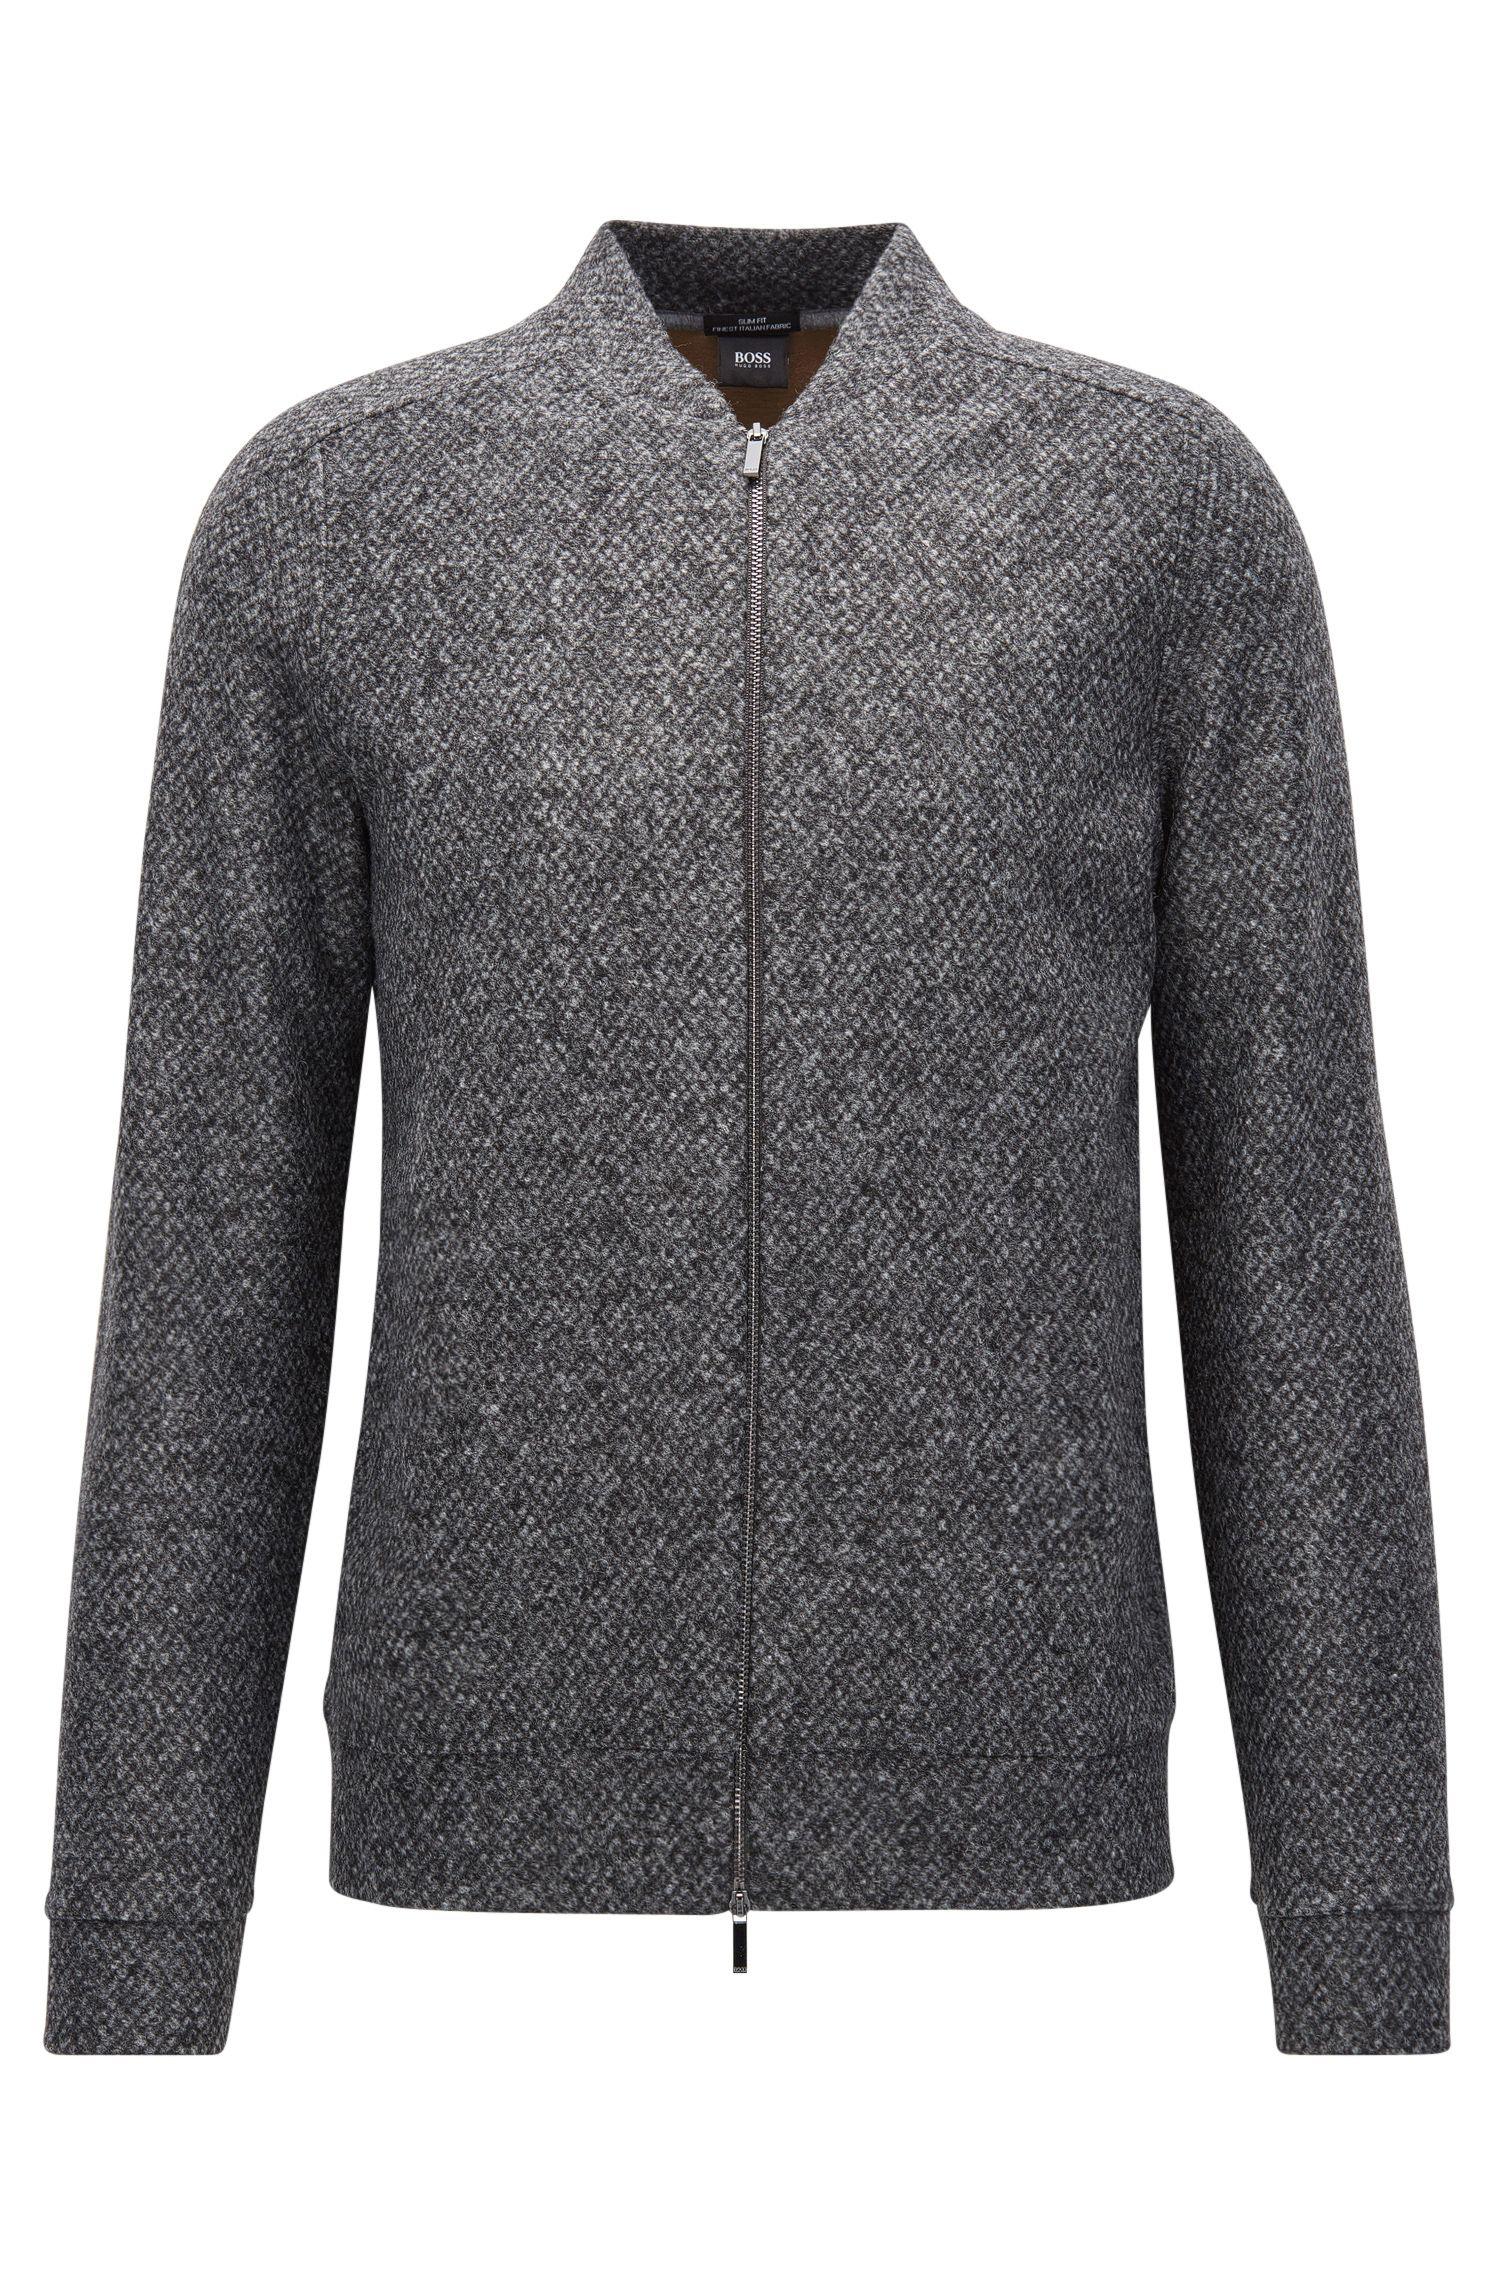 Oversized Argyle Stretch Virgin Wool Jacket | Salea